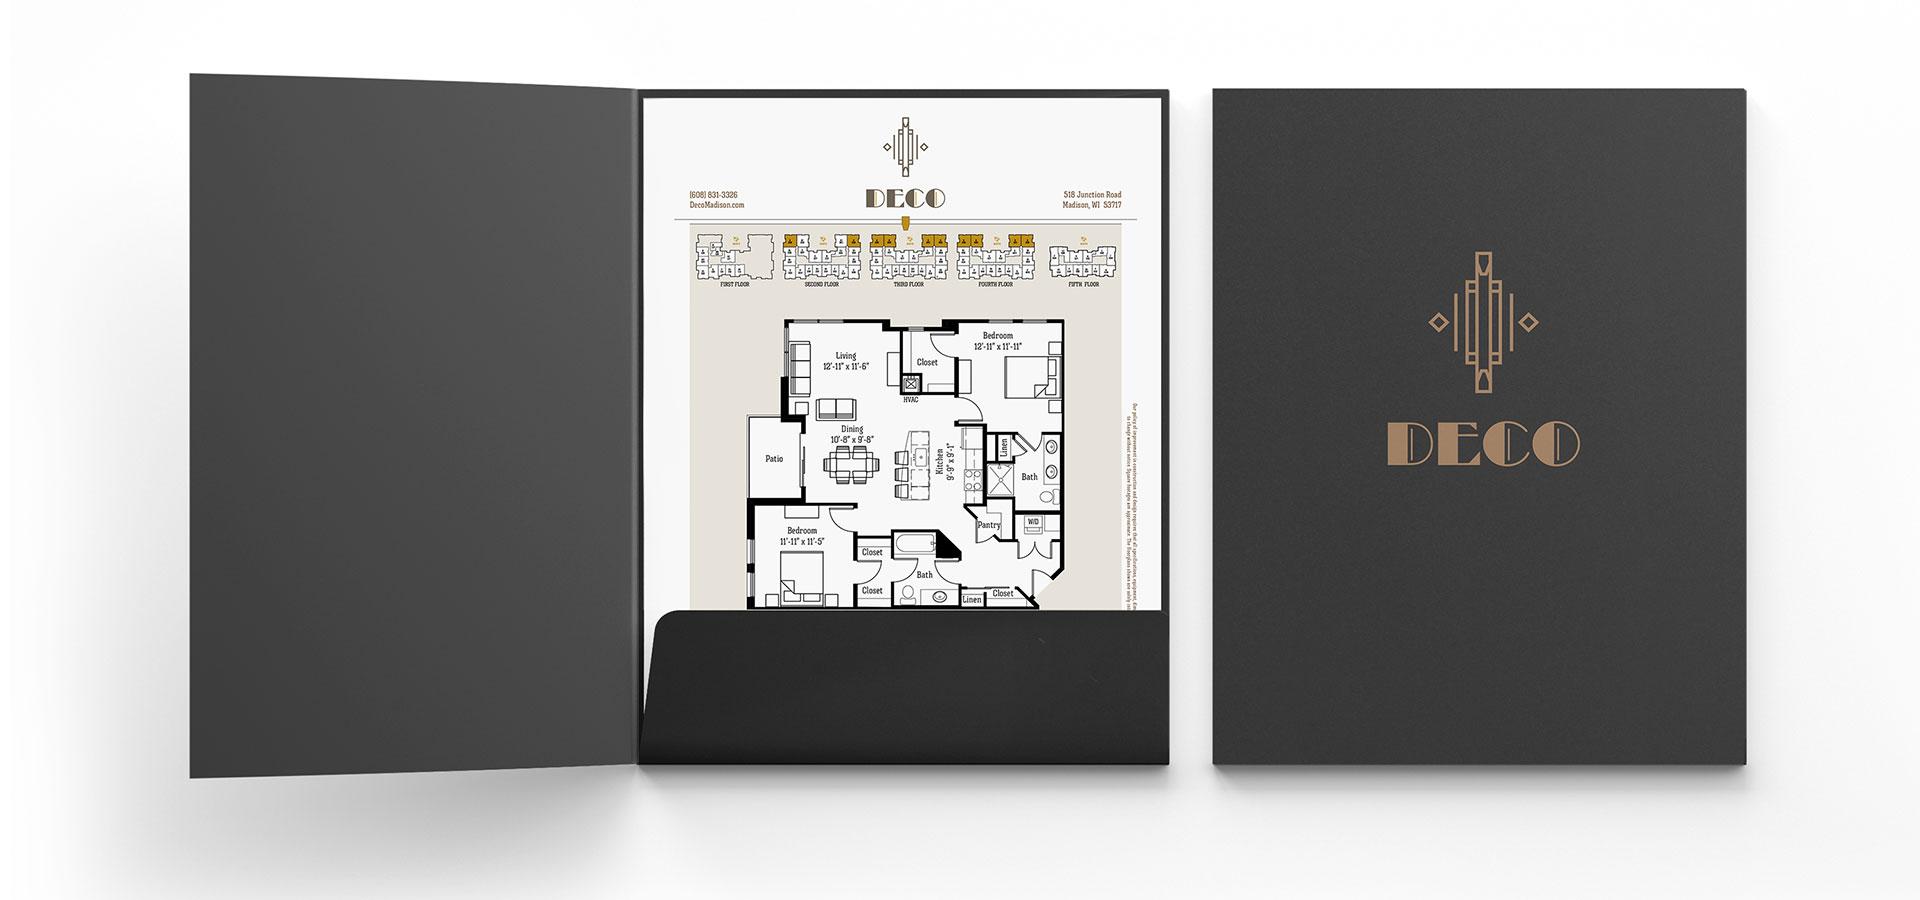 Folder design for Deco apartments